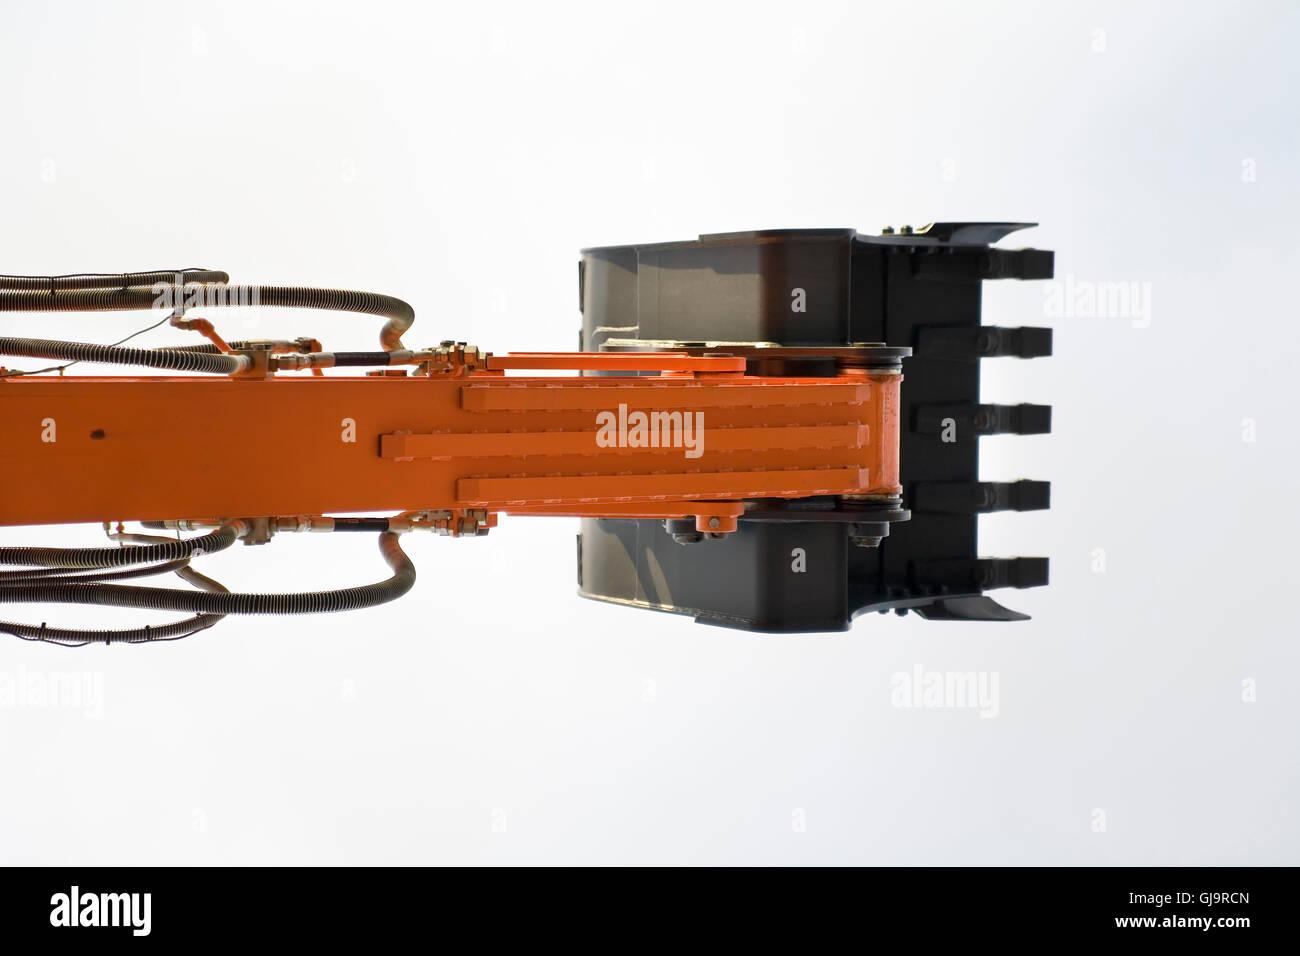 excavator's shovel - Stock Image